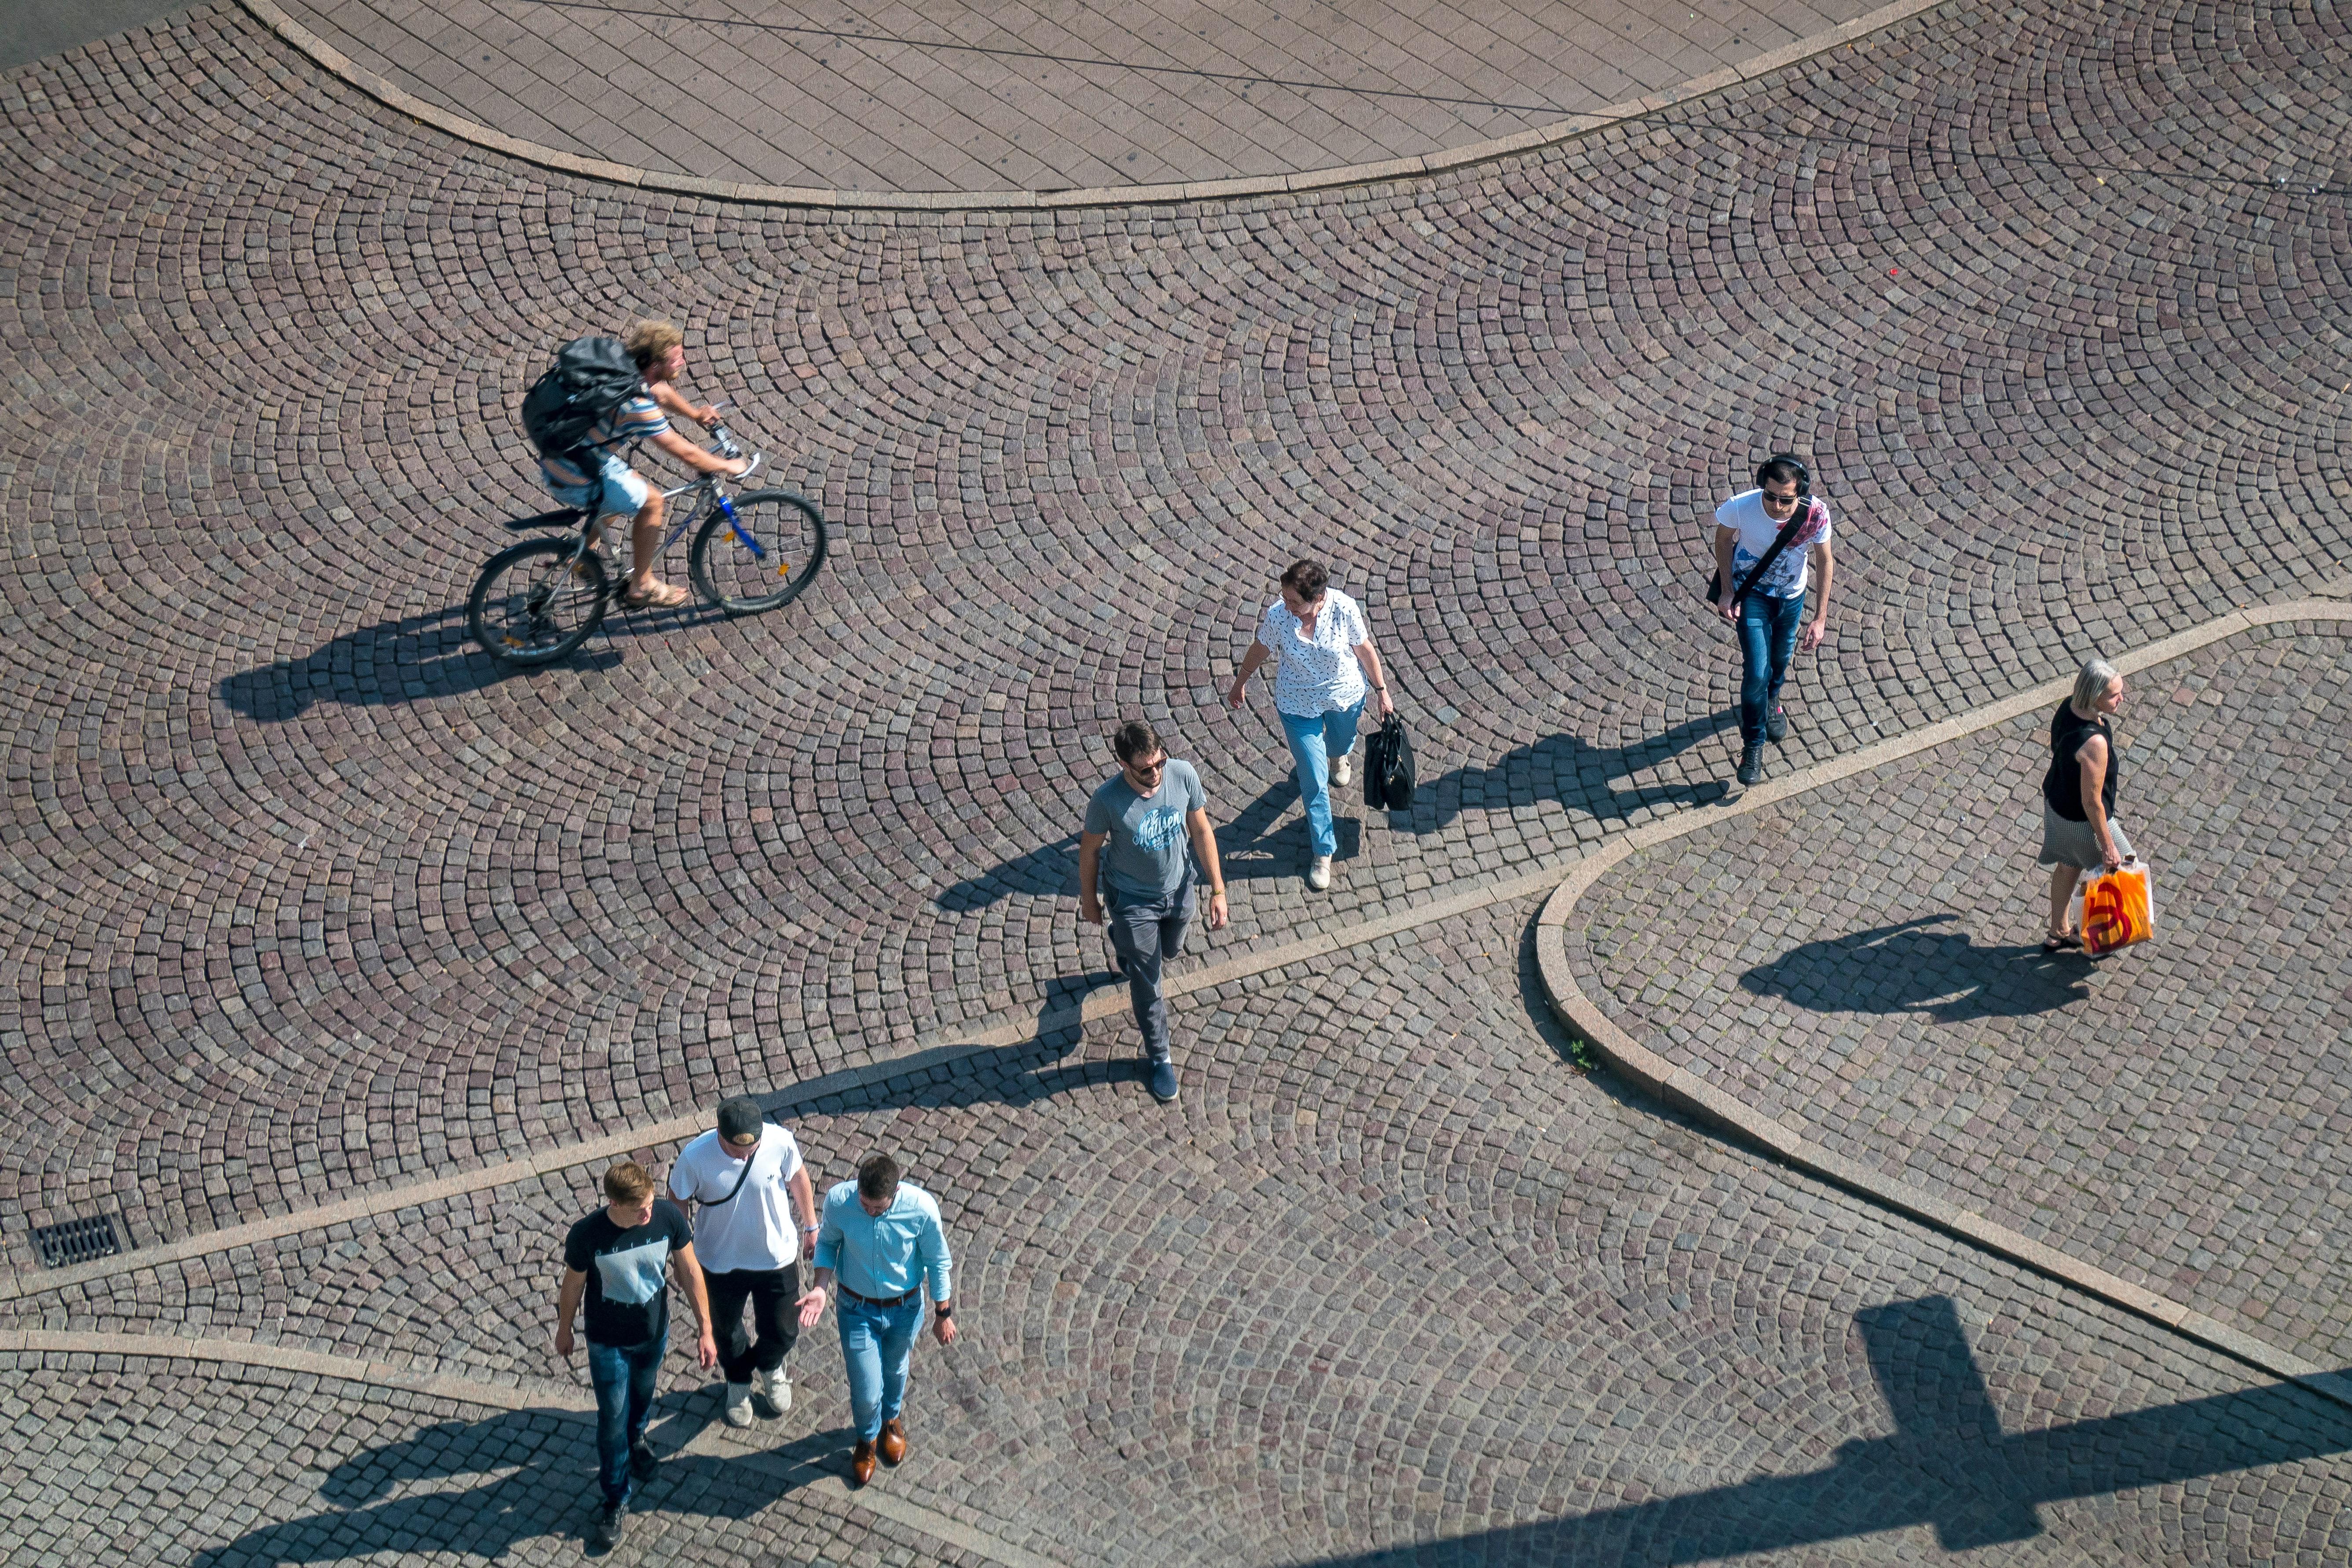 5 Benefits Of Biking Or Commuting On Foot